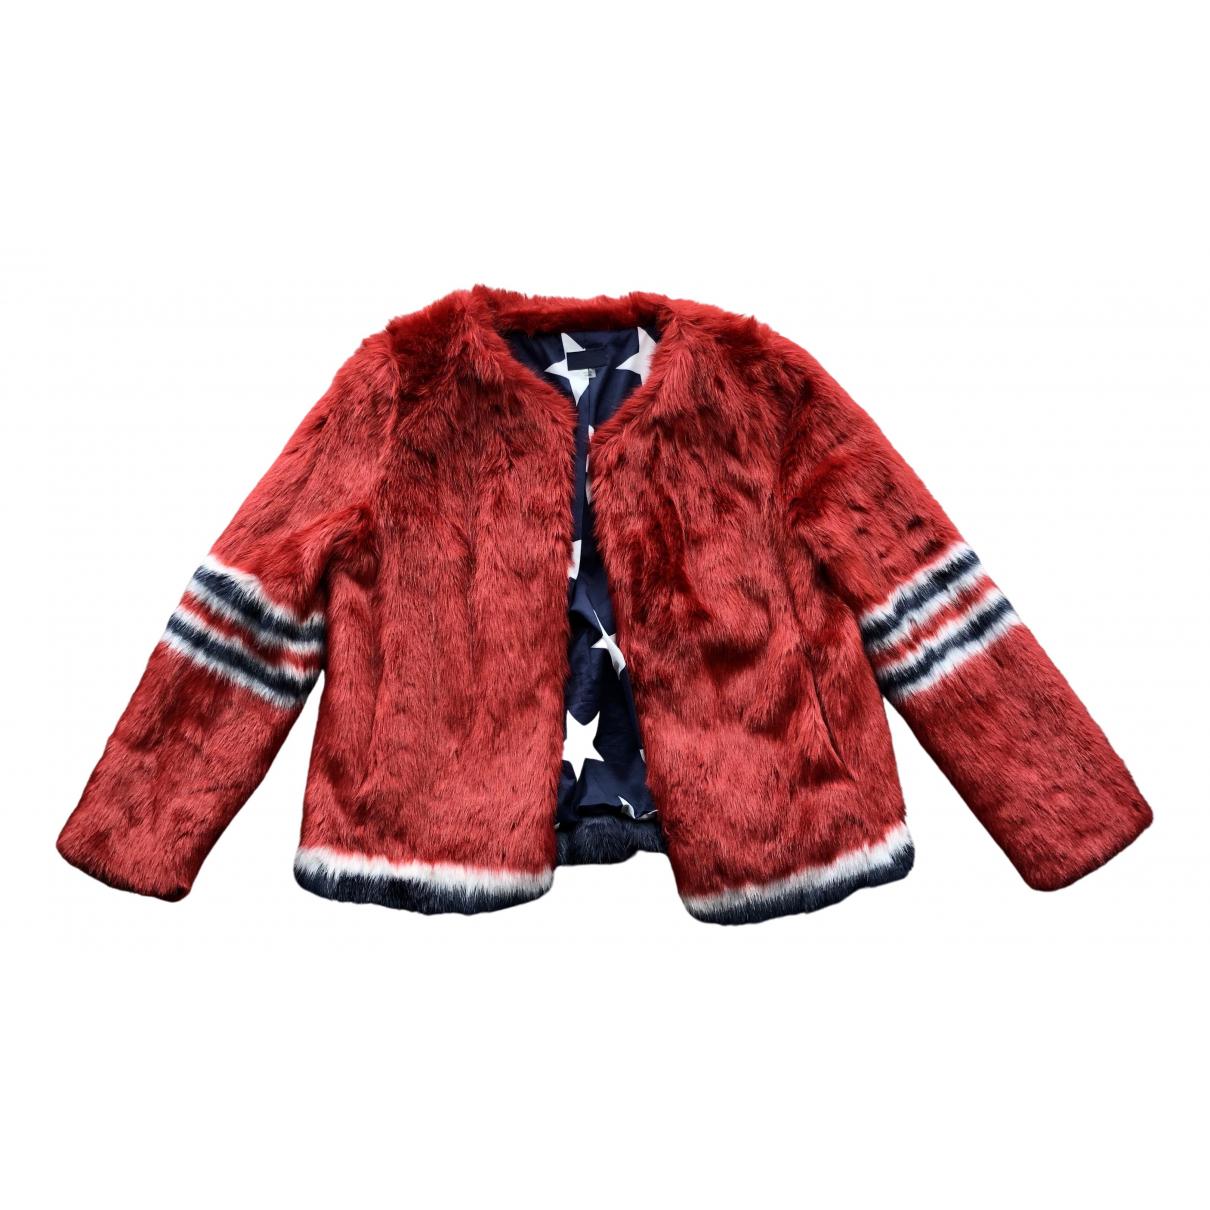 MN Red jacket for Women S International